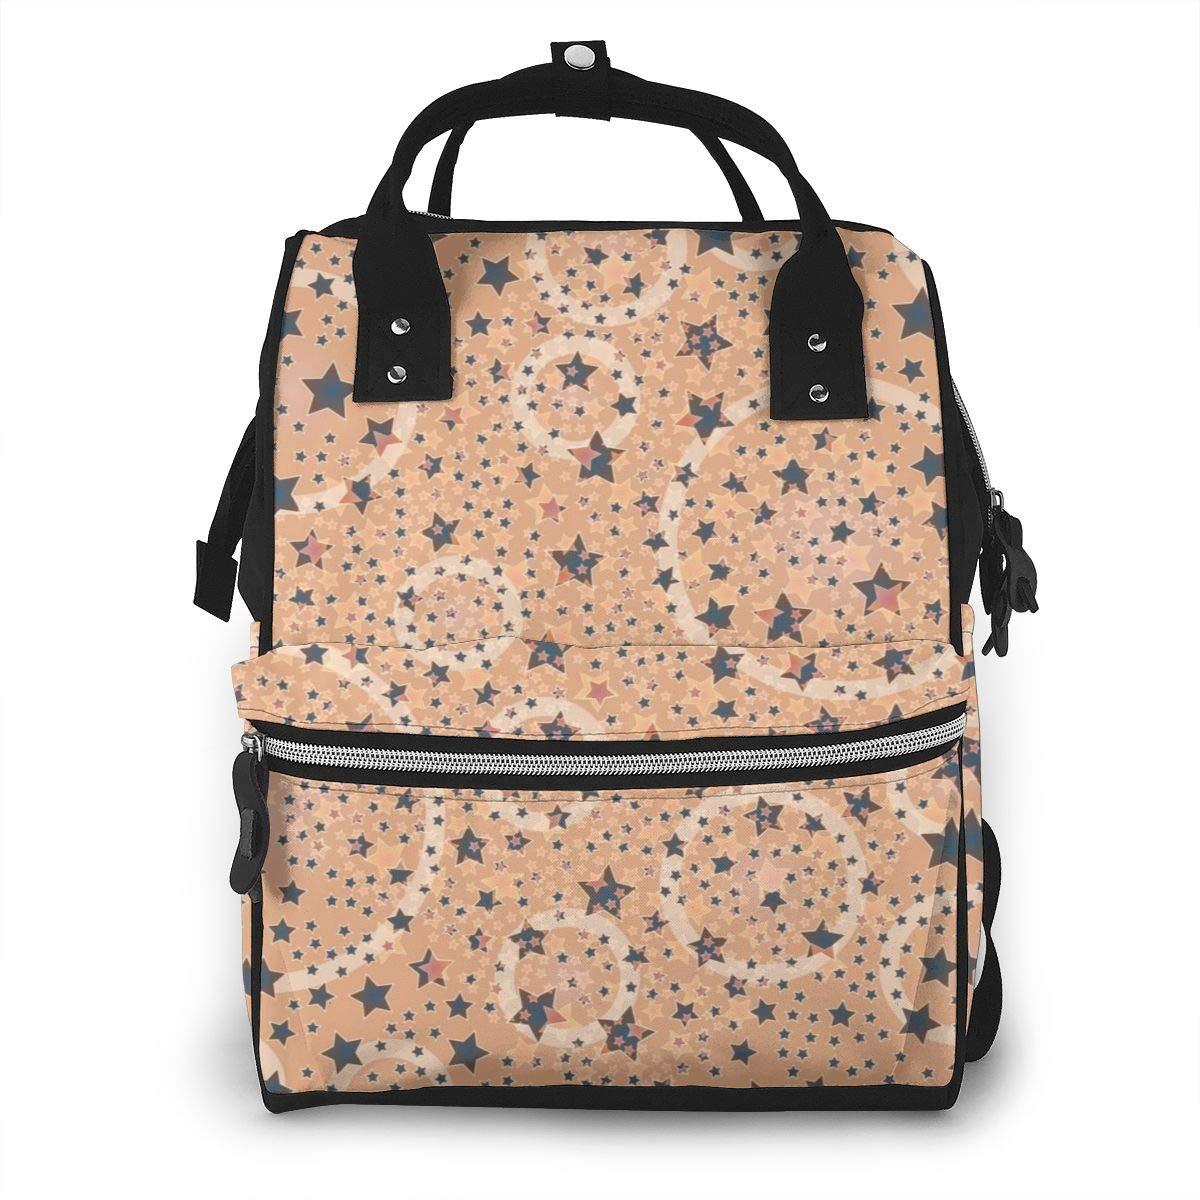 Diaper Bag Backpack Large Capacity Baby Bag Multi-Function Travel Backpack